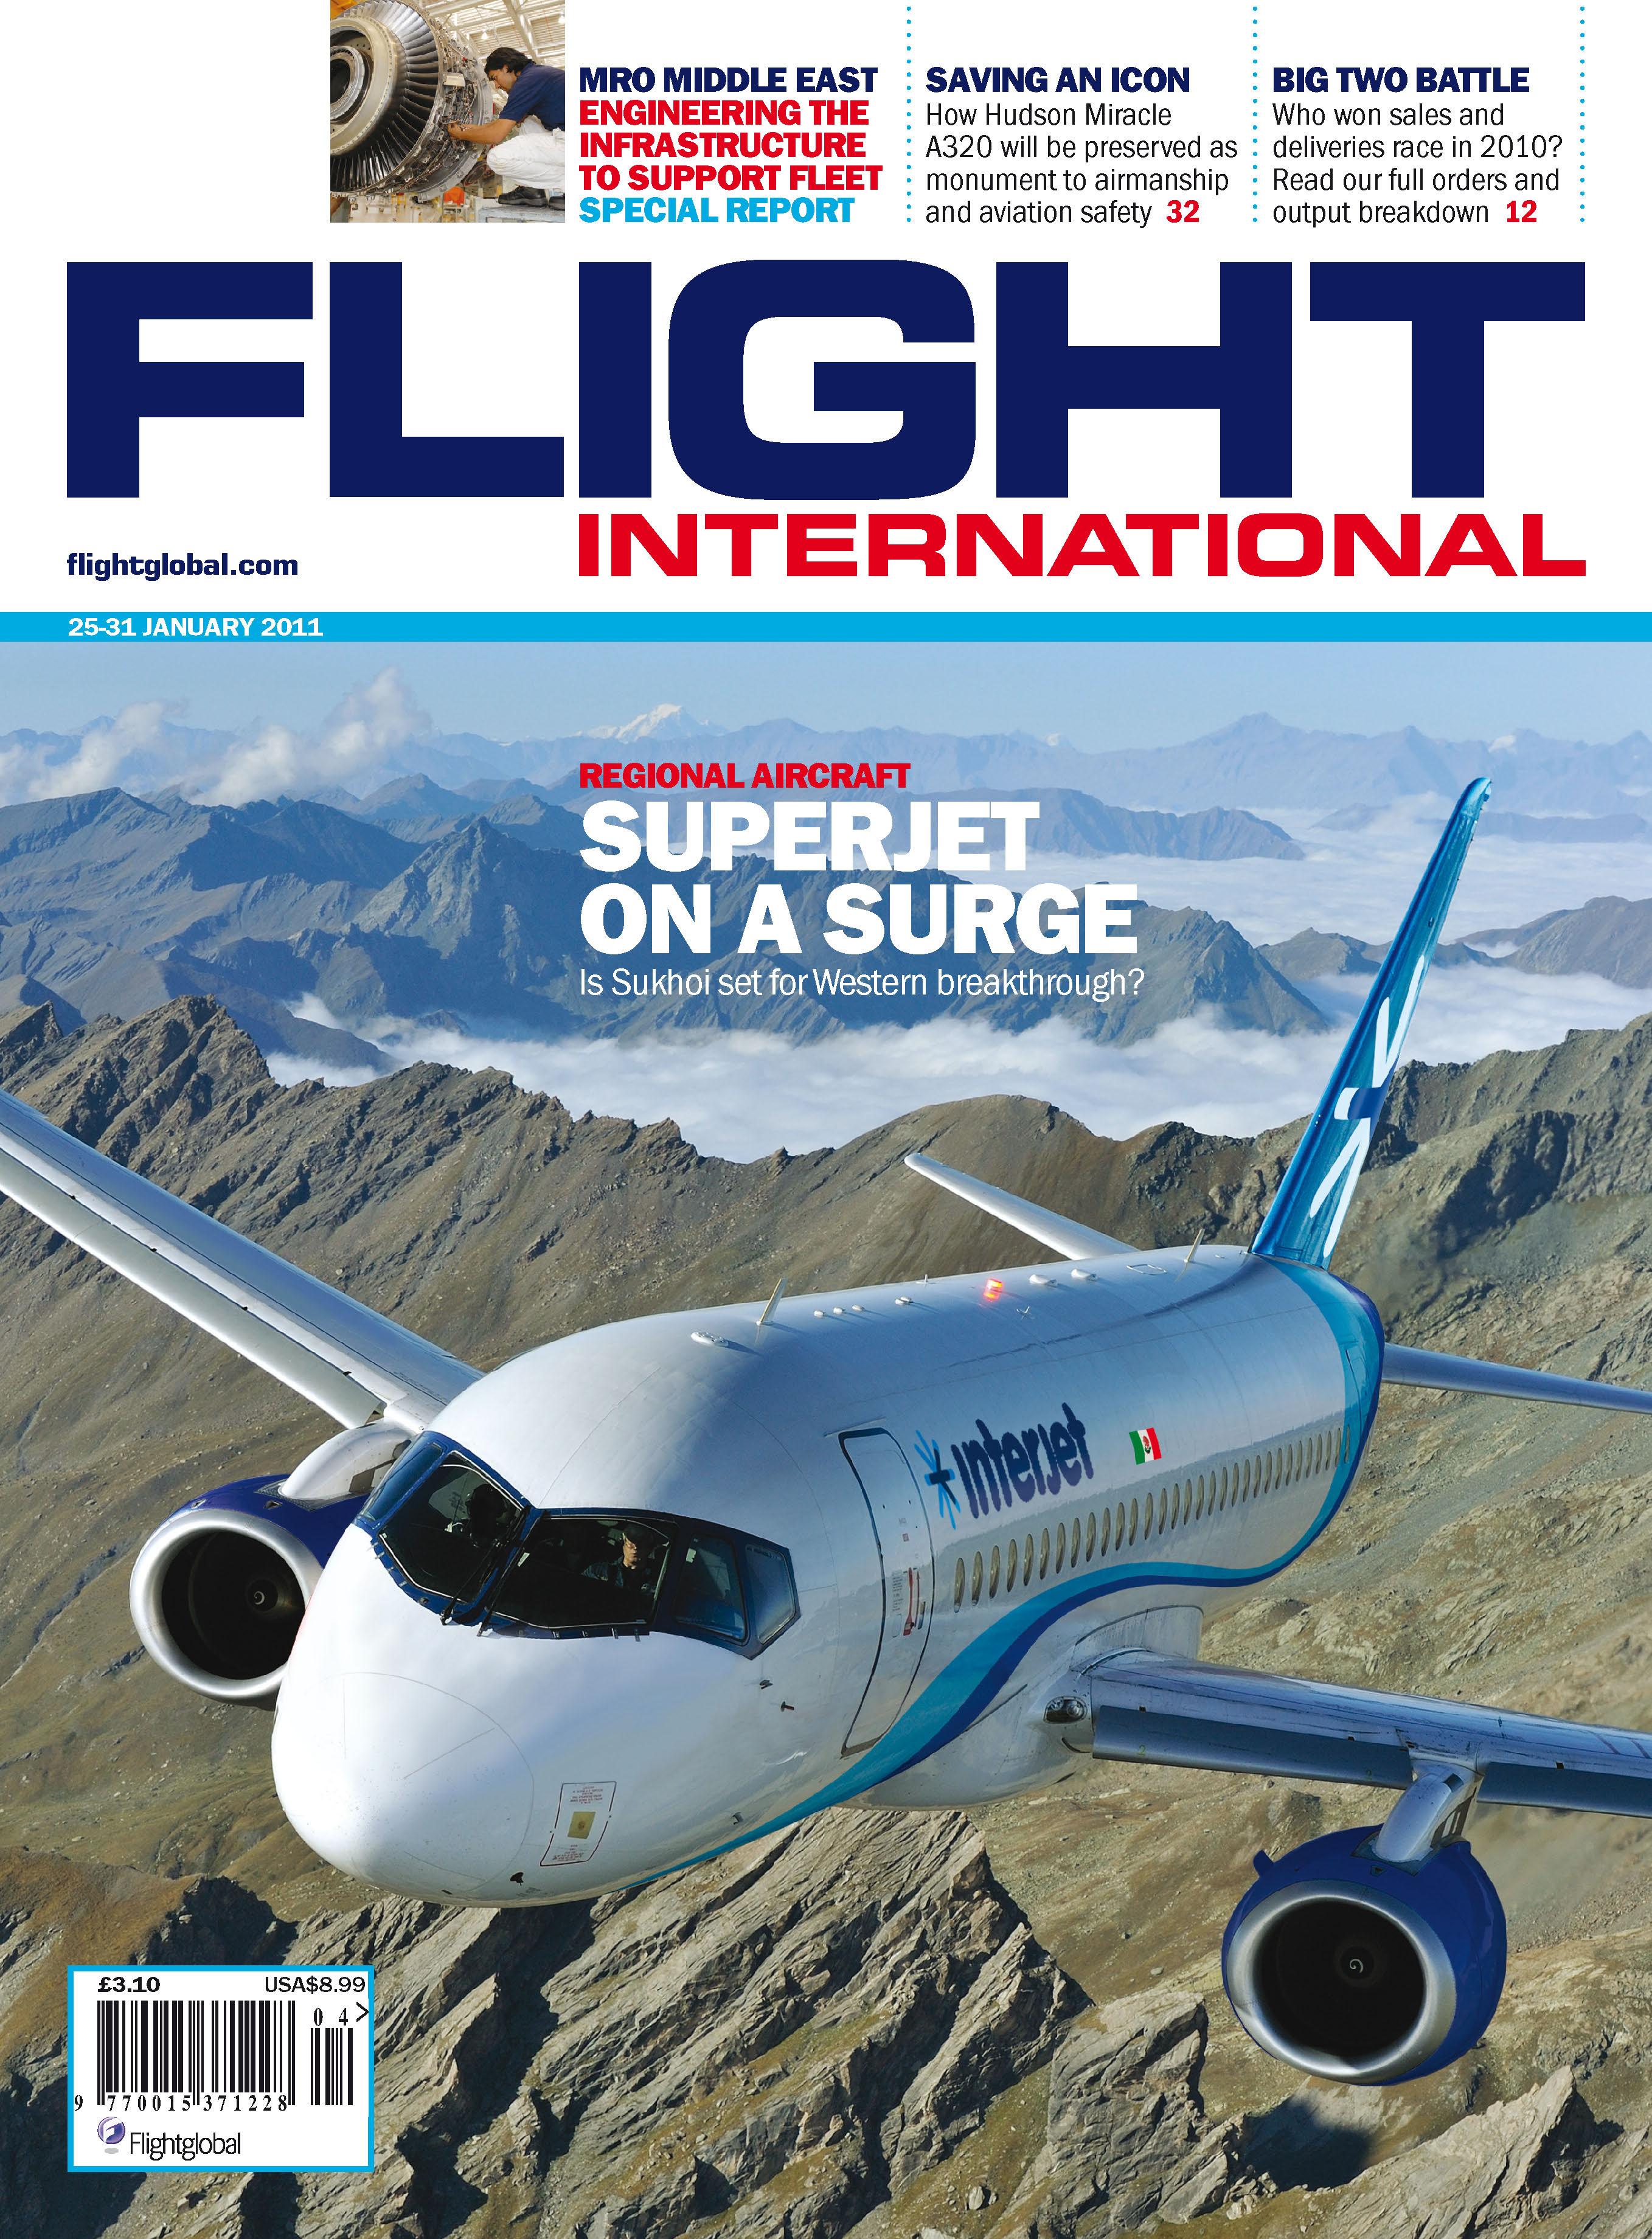 Hudescommunications Com: Star Navigation Systems Group Inc Featured In FLIGHT